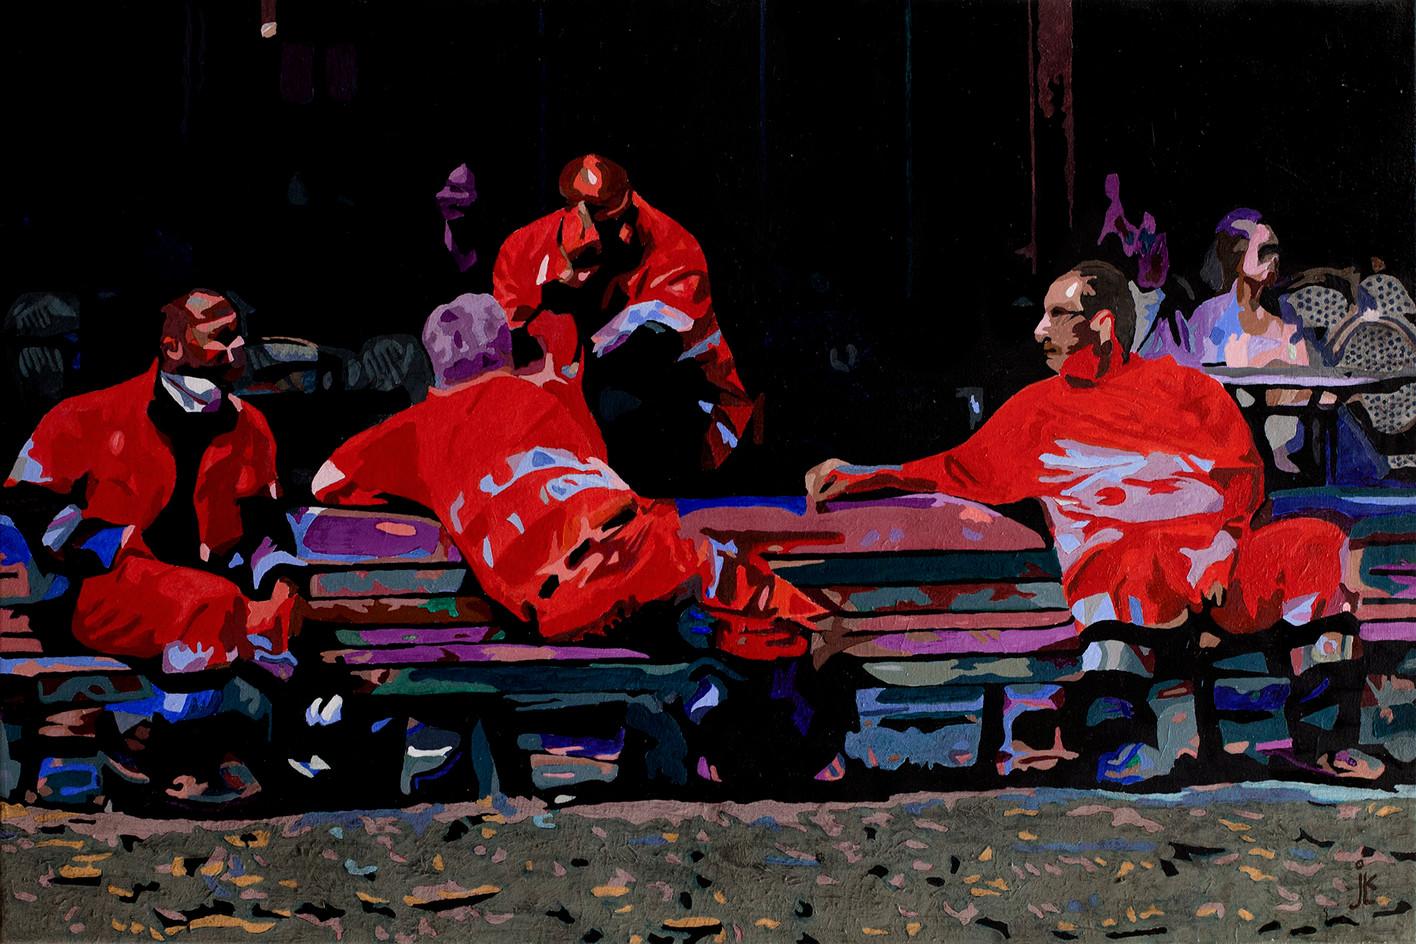 Firemen Wearing Red